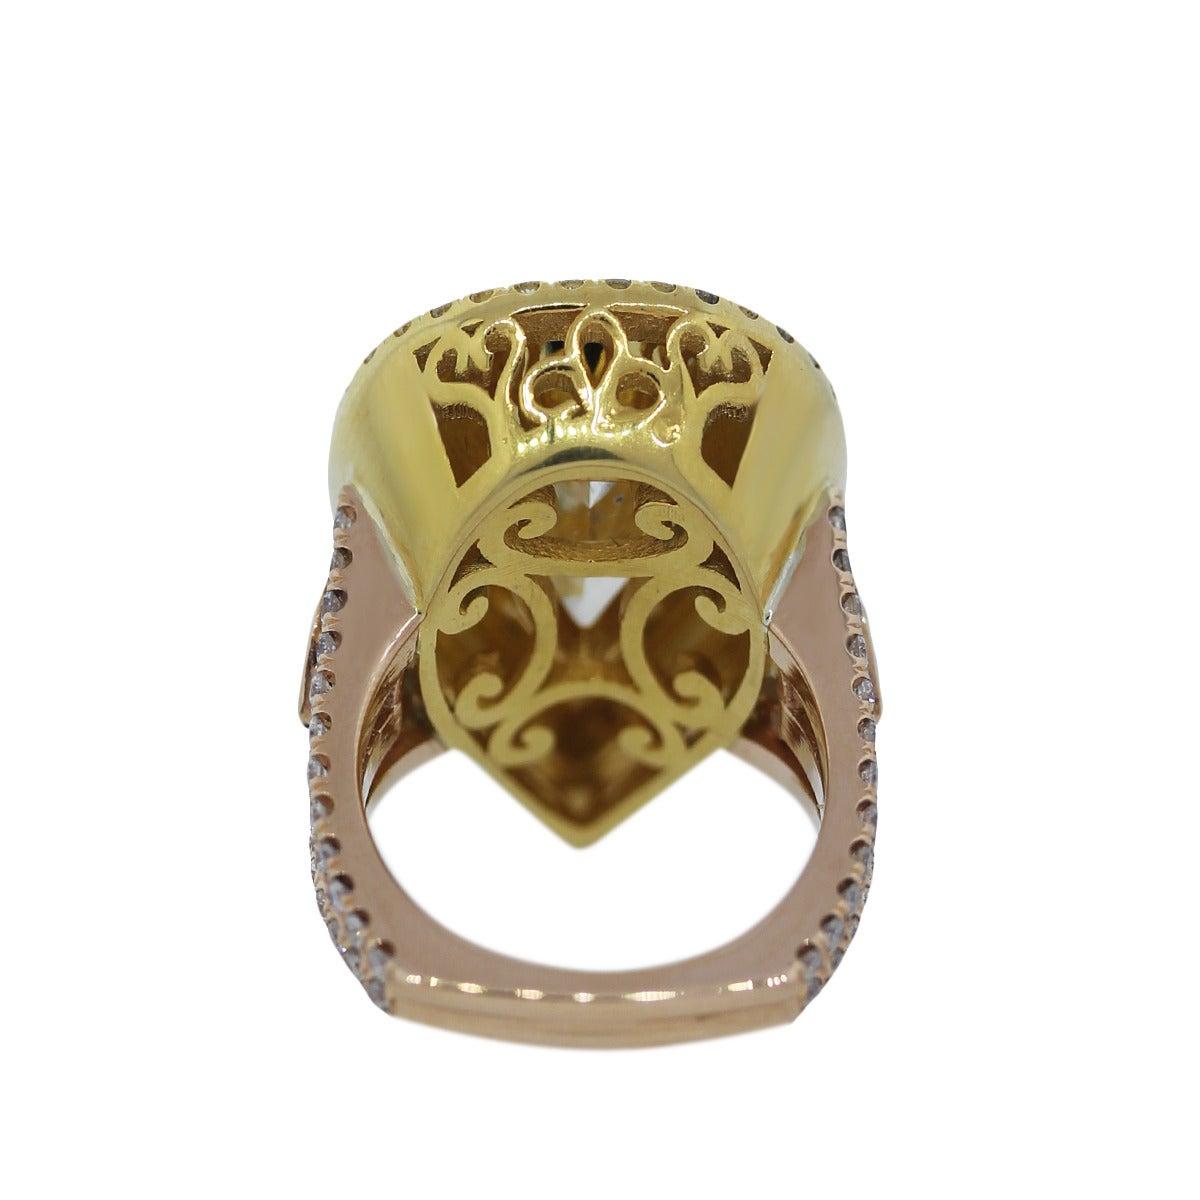 14 33 carat fancy light yellow pear shaped gold